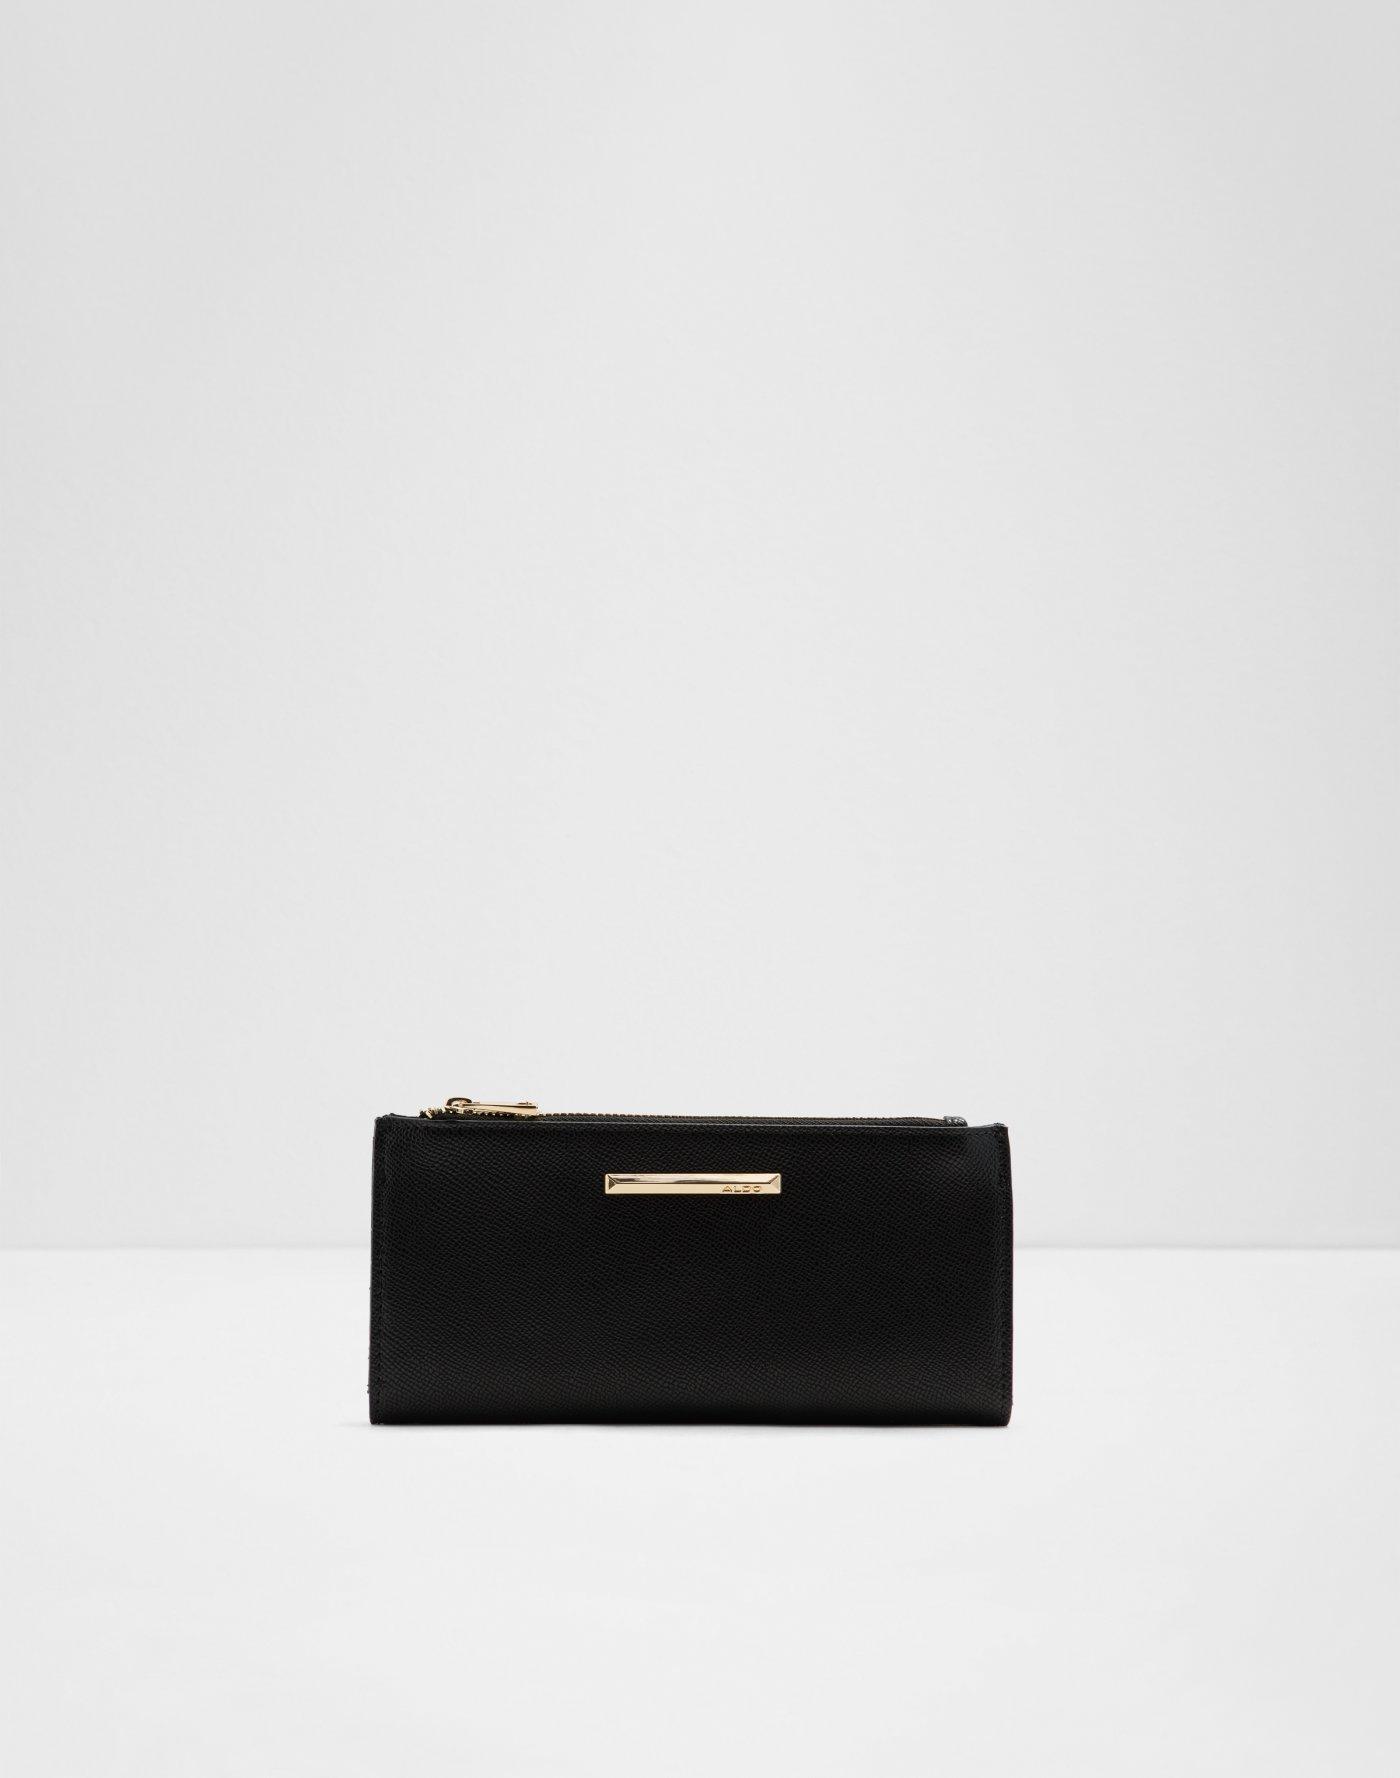 9062558b66 Handbags on Sale for Women | ALDO Canada | ALDO Canada